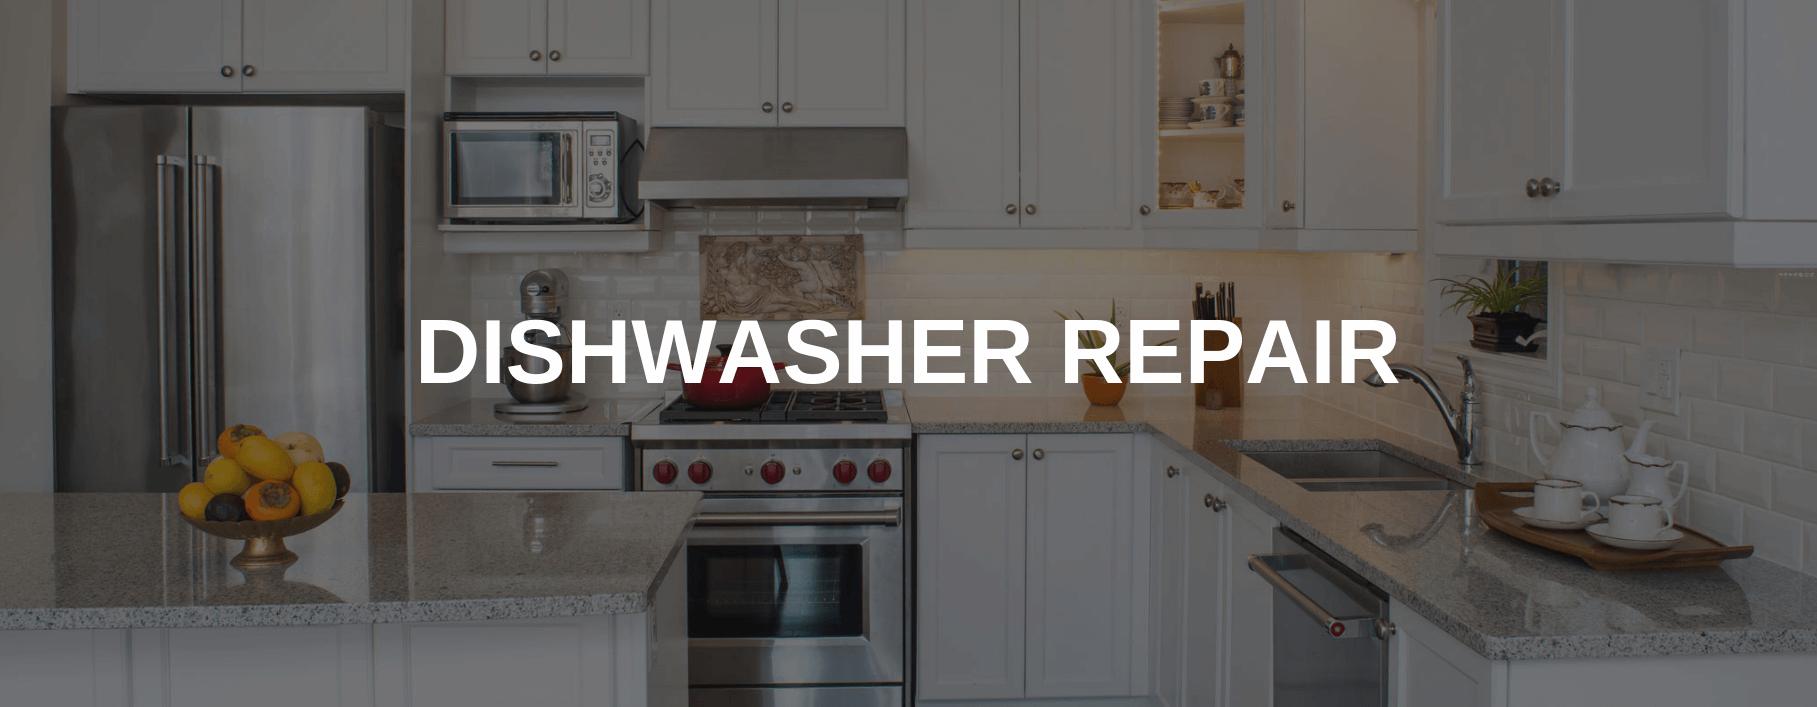 dishwasher repair quincy